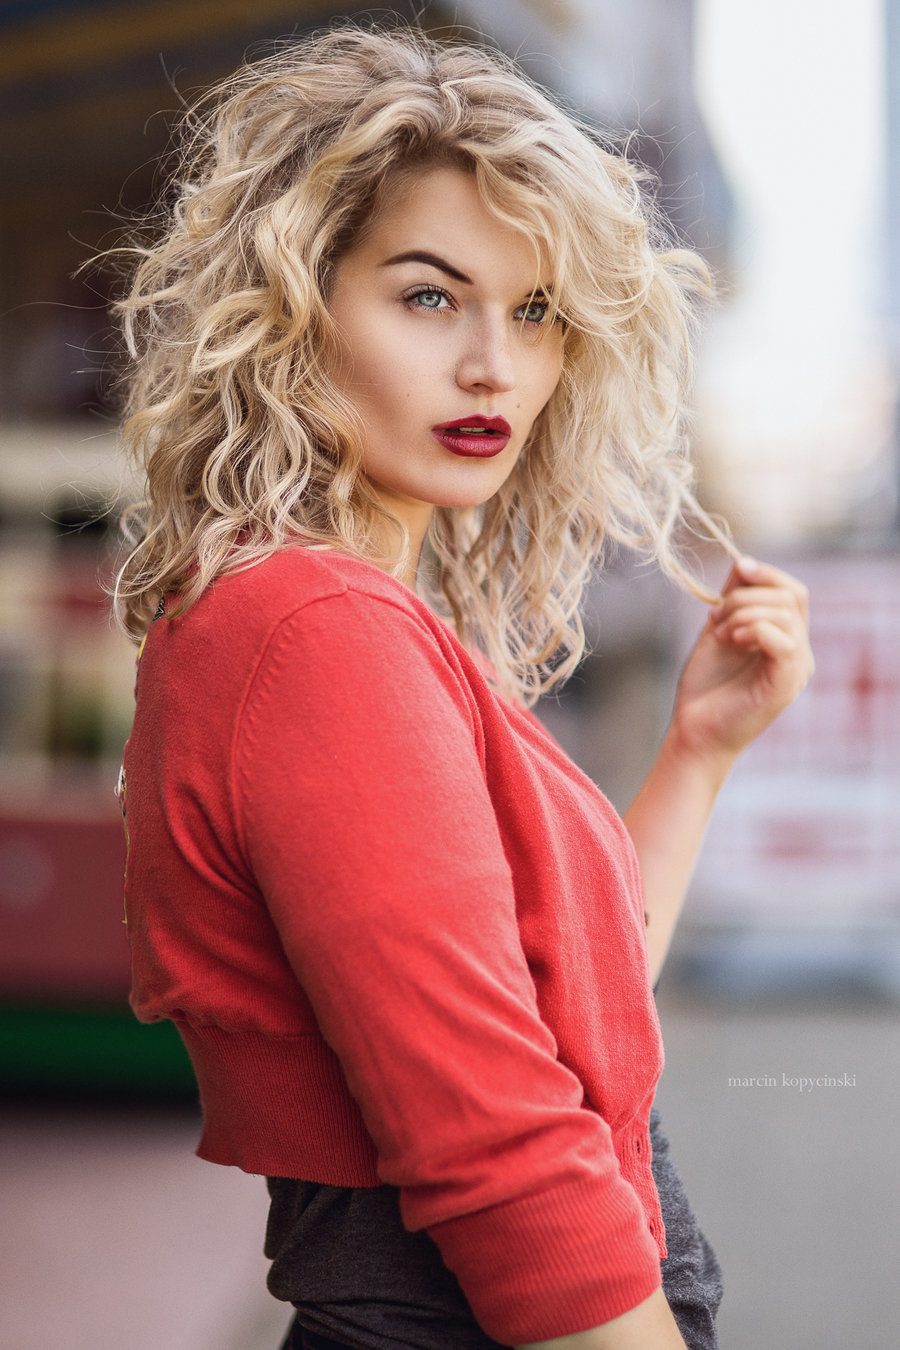 Golden Girl / Photography by Marcin K, Model Jessica Megan / Uploaded 6th October 2016 @ 08:34 AM